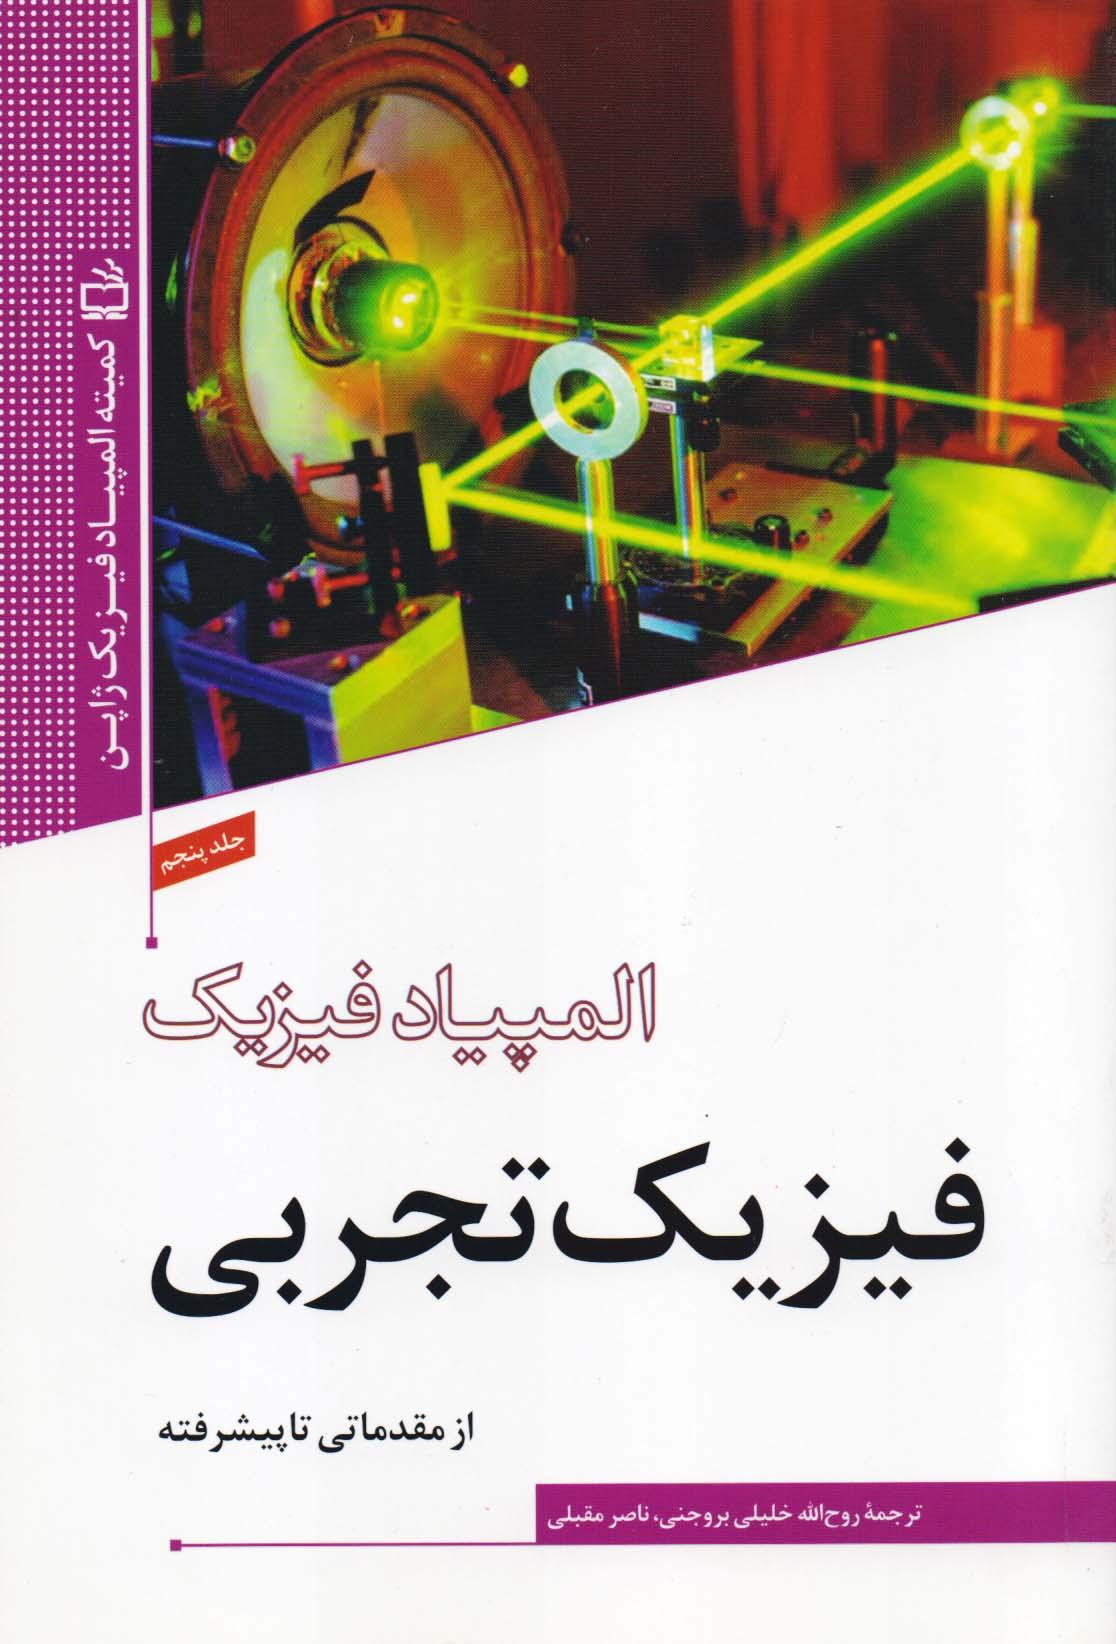 المپیاد فیزیک - فیزیک تجربی